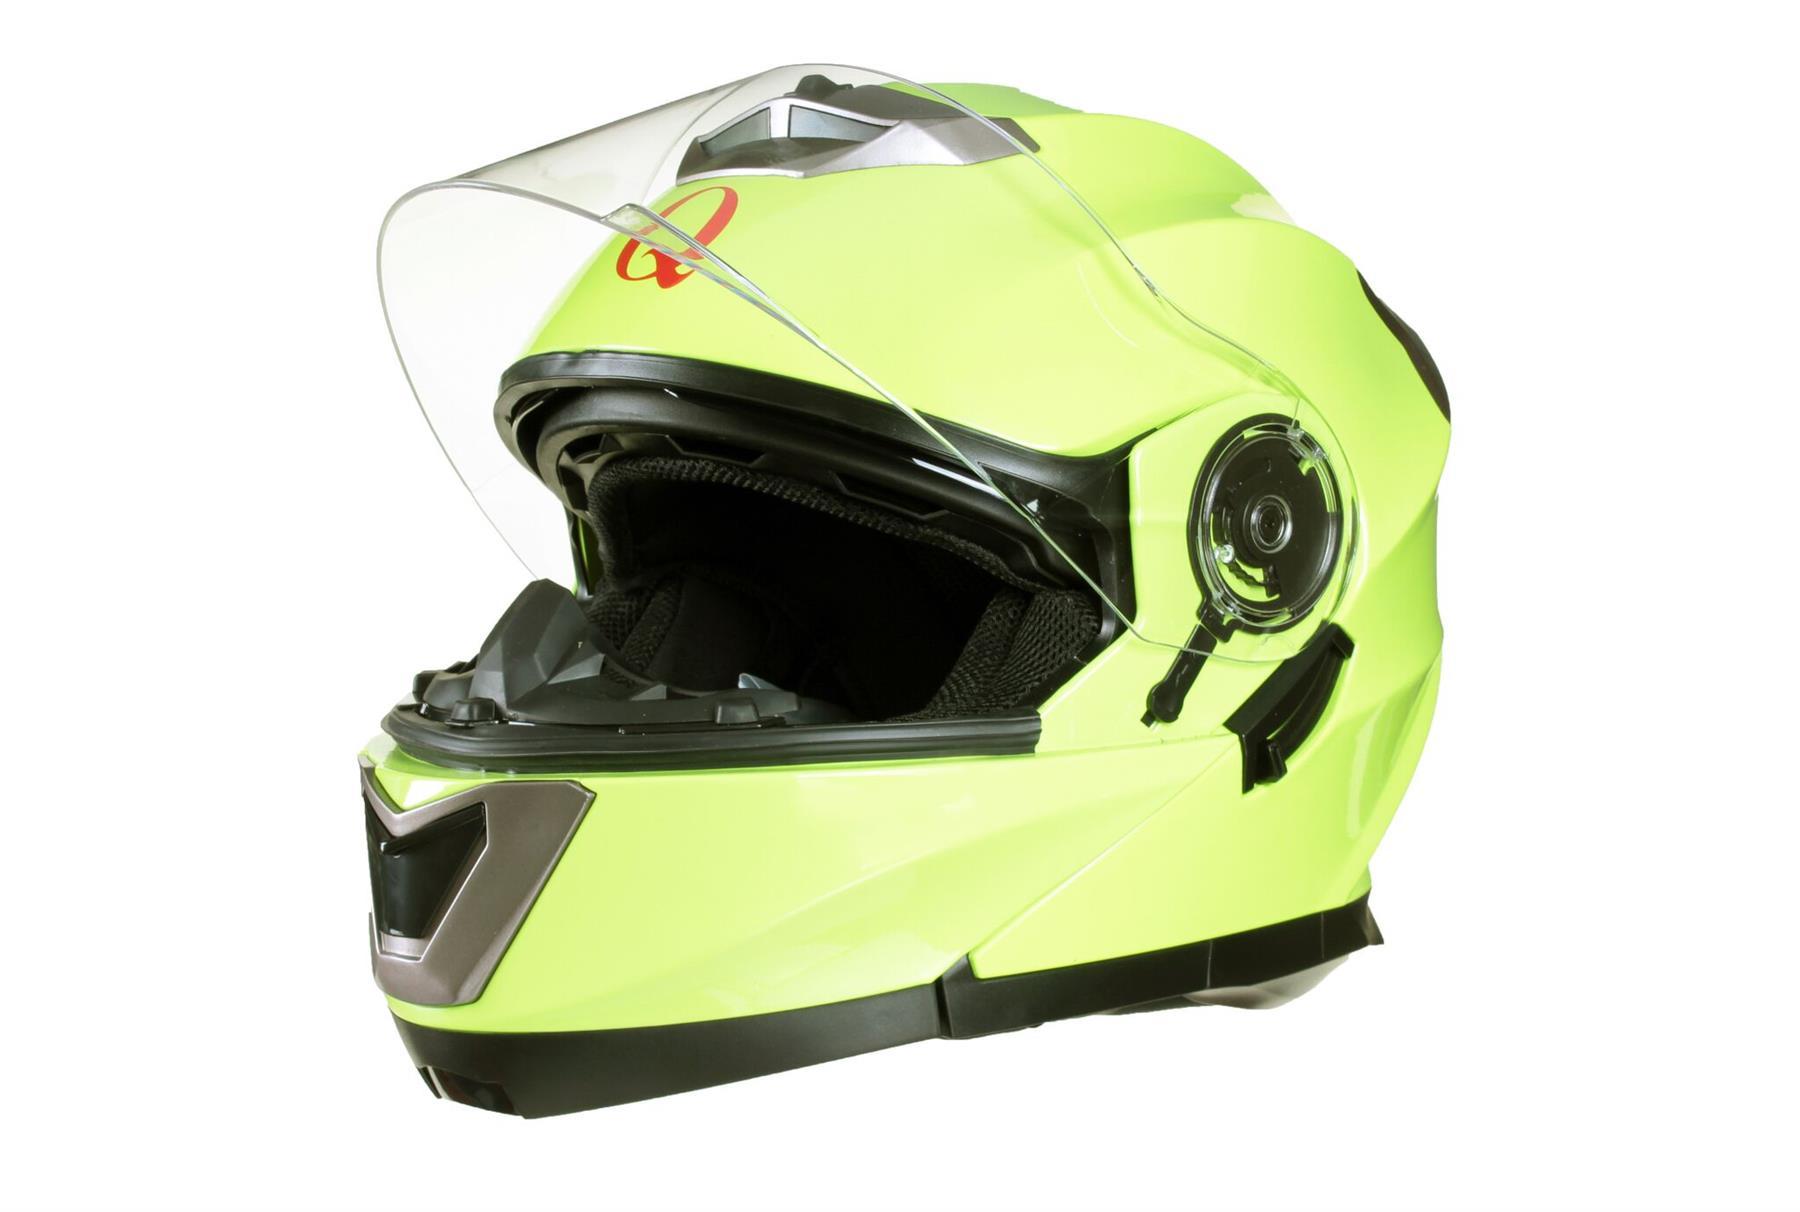 MODULAR-Flip-up-Front-Helmet-DOUBLE-Visor-MOTORCYCLE-Motorbike-Colour-CHOICE miniature 20